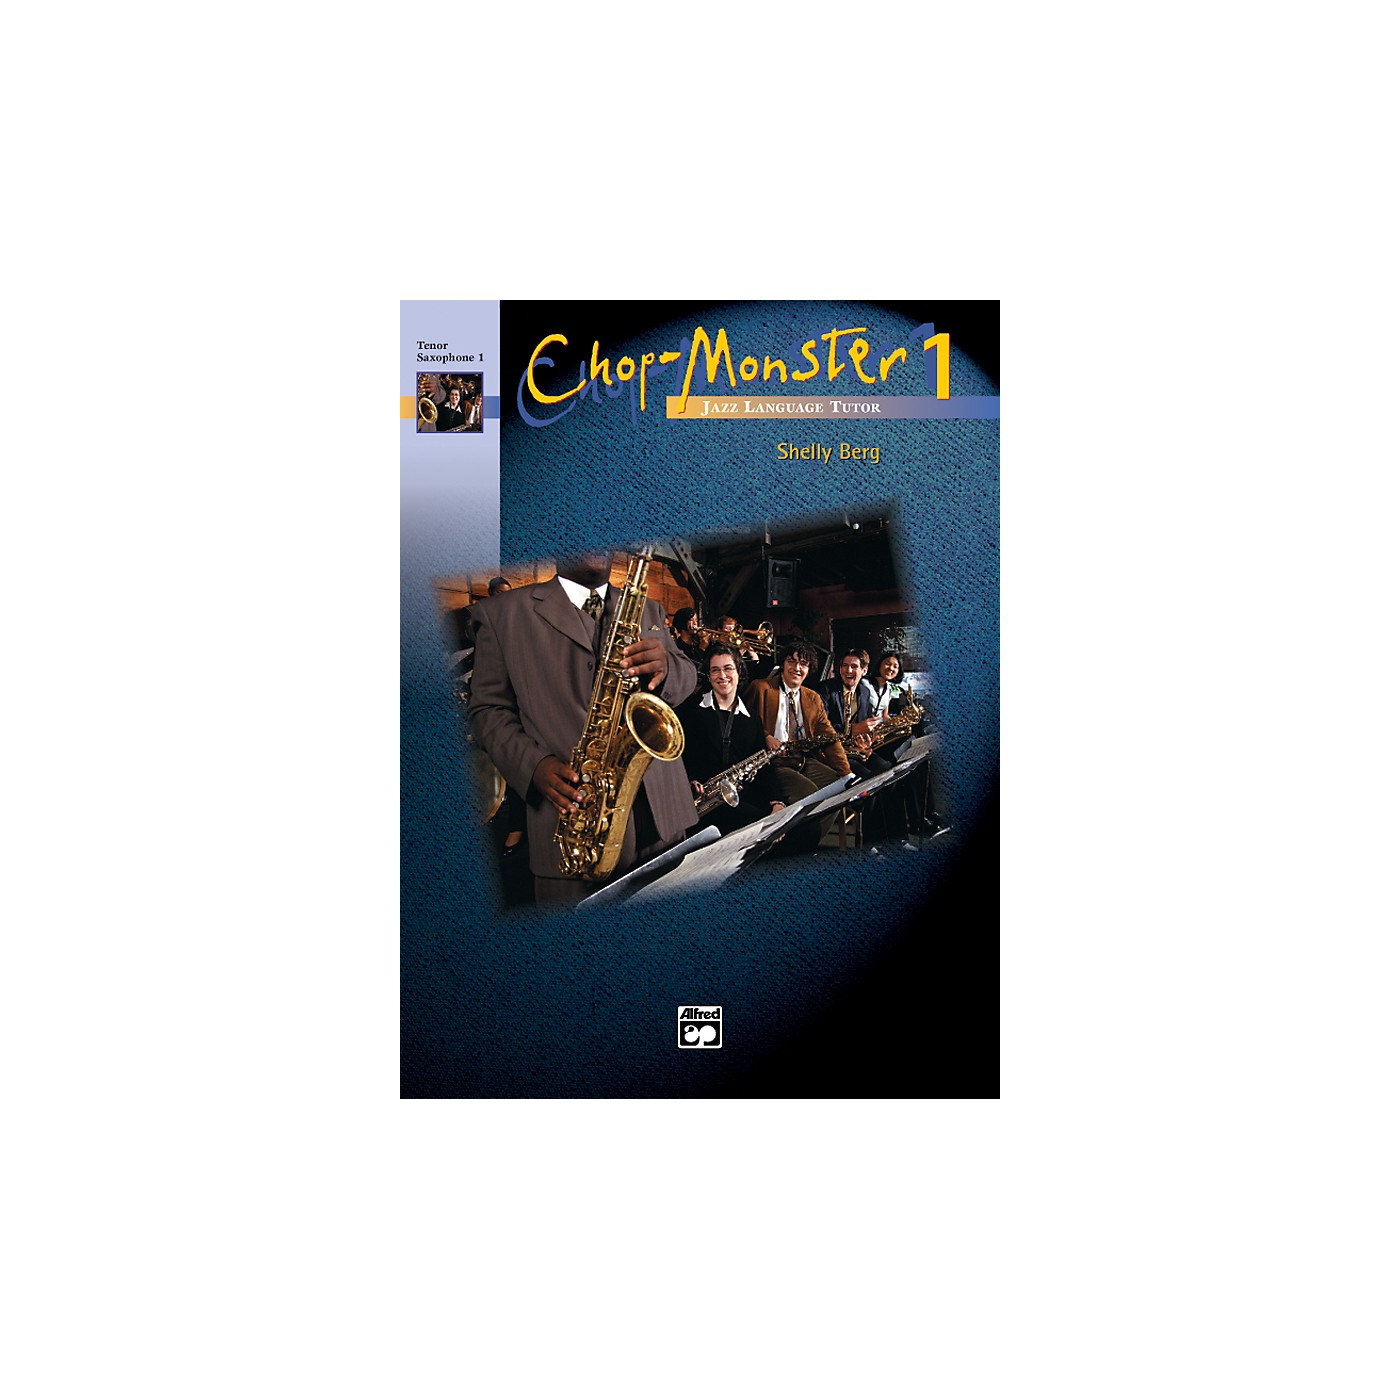 Alfred Chop-Monster Book 1 Trumpet 2 Book & CD thumbnail